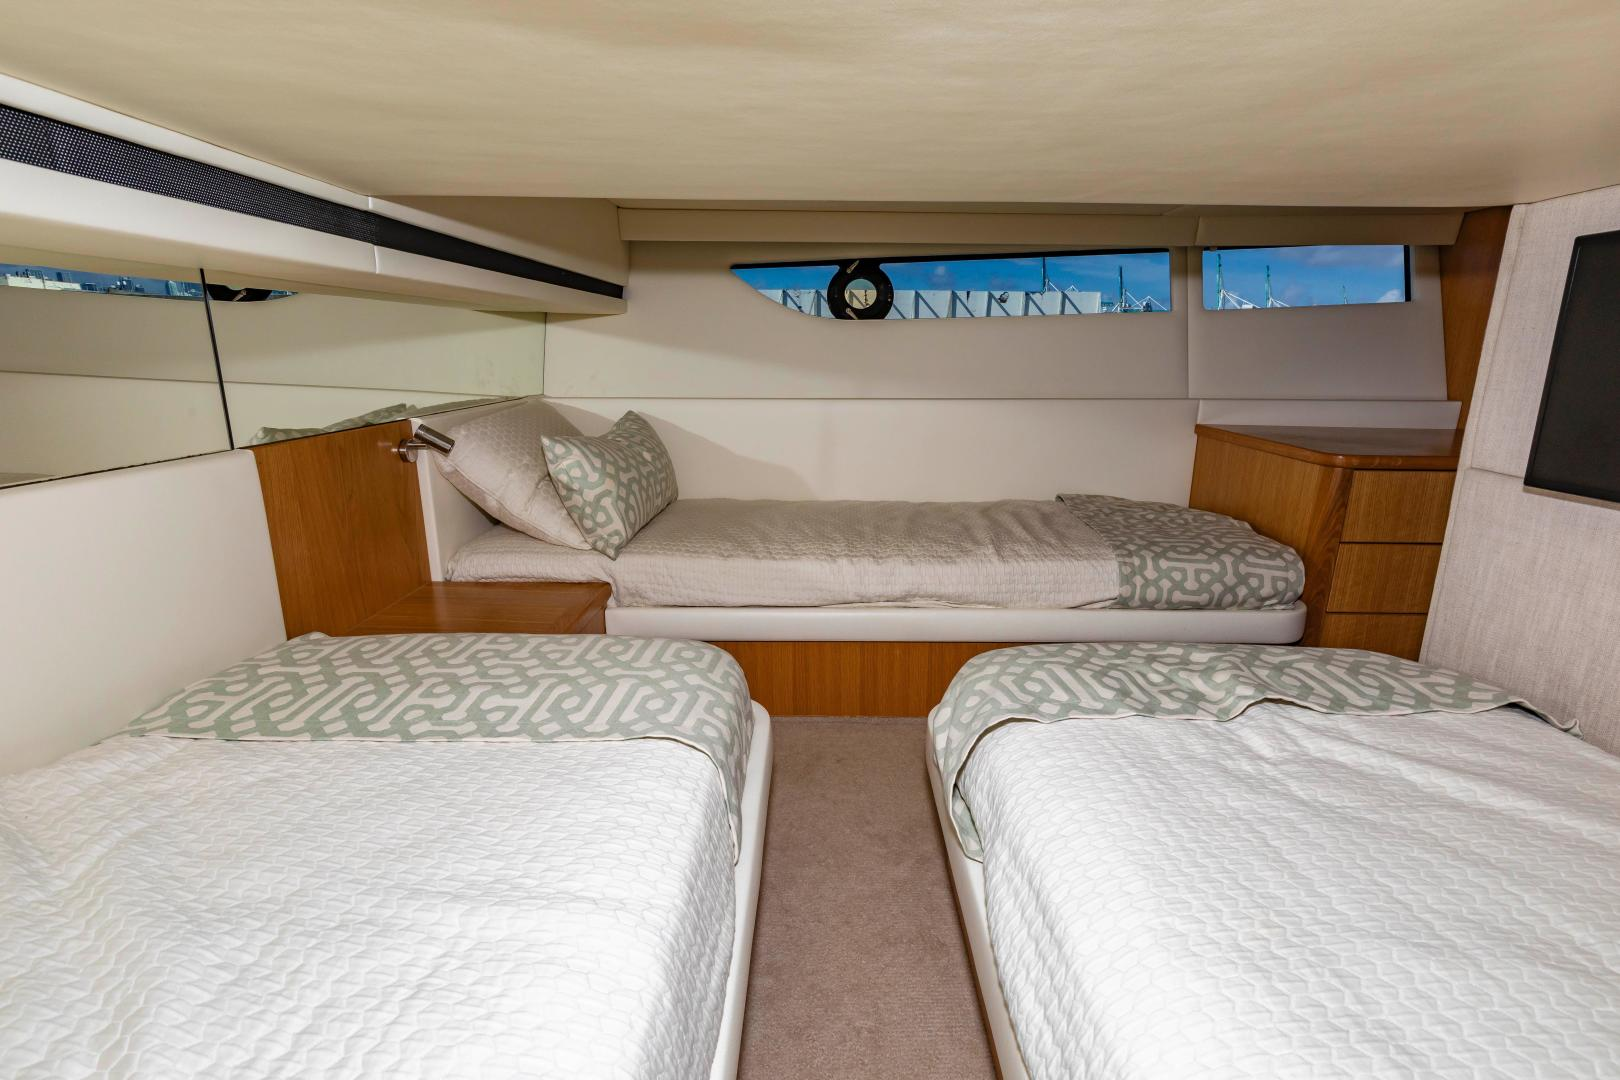 Riviera-395 SUV 2019-Ipanema Miami Beach-Florida-United States-1614914   Thumbnail